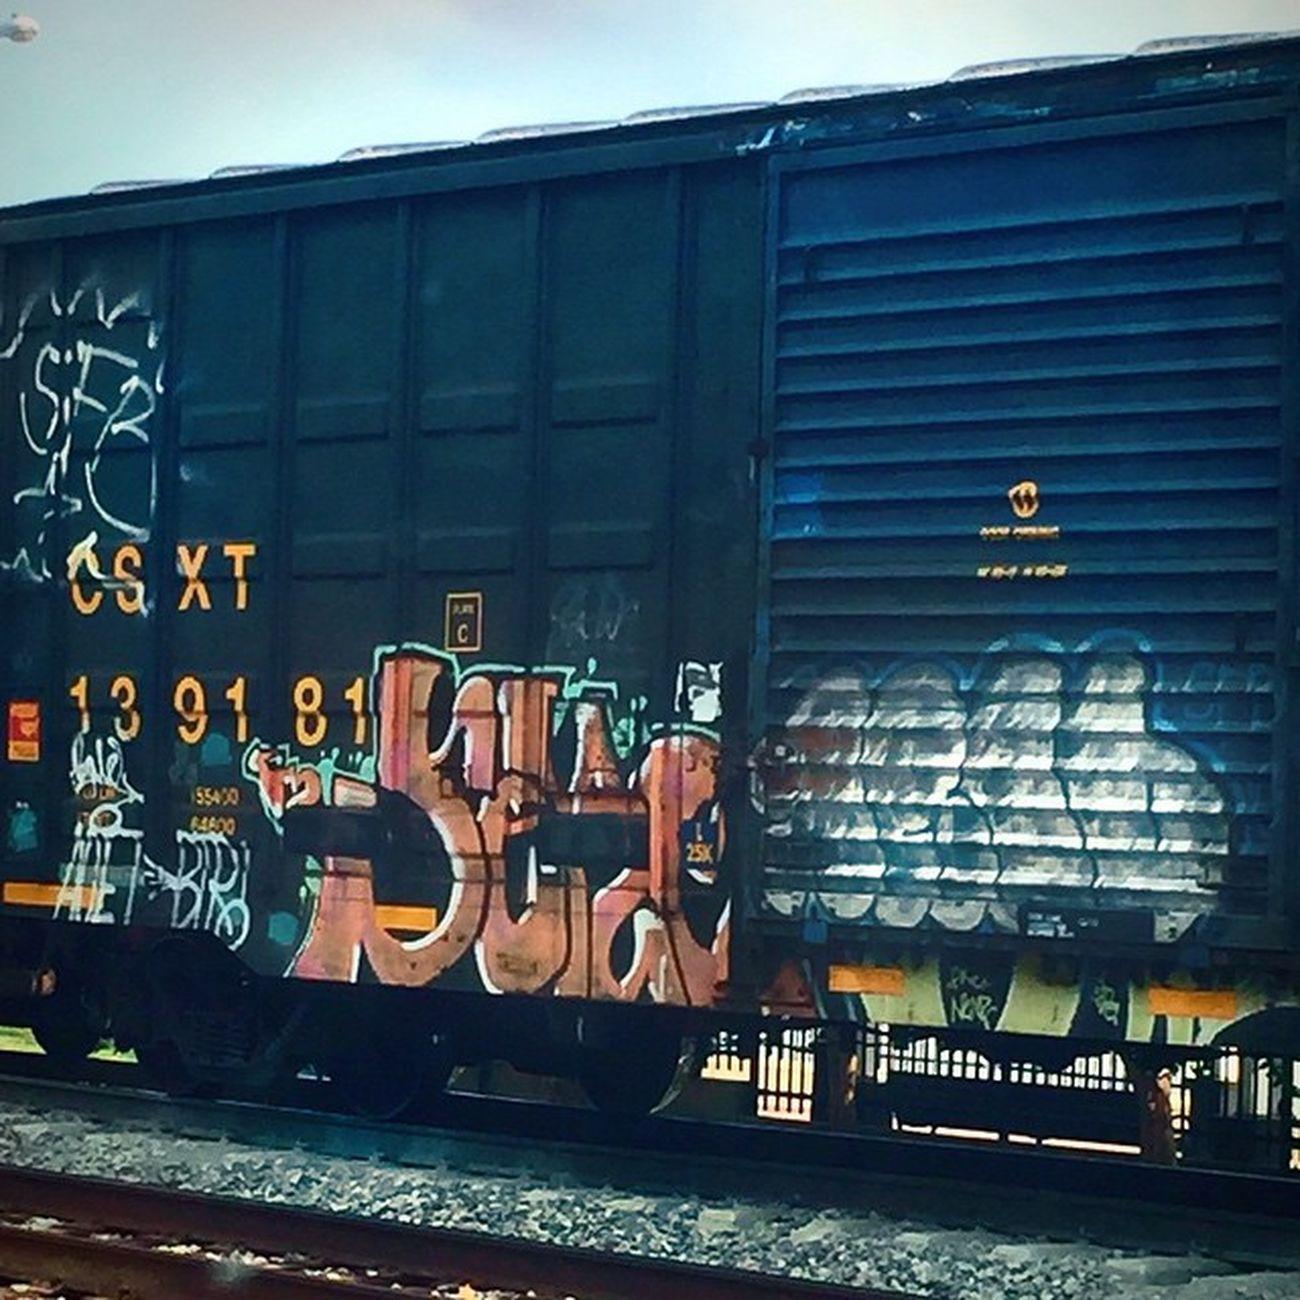 Traingraffiti Fotofanatics_streetlife Rsa_street Rsa_graffiti Splendid_urban Streetdreamsmag Streetphoto Clickgeardaily Ig_street Igers Illgrammers DOPESHOTS Graffiti Photogrid Ig_klub Ig_streetphoto Ig_streets_unite Igrecommend Justgoshoot Ig_shutterbugs Artfido Super_shotz Splendid_streetview Artofrailroad